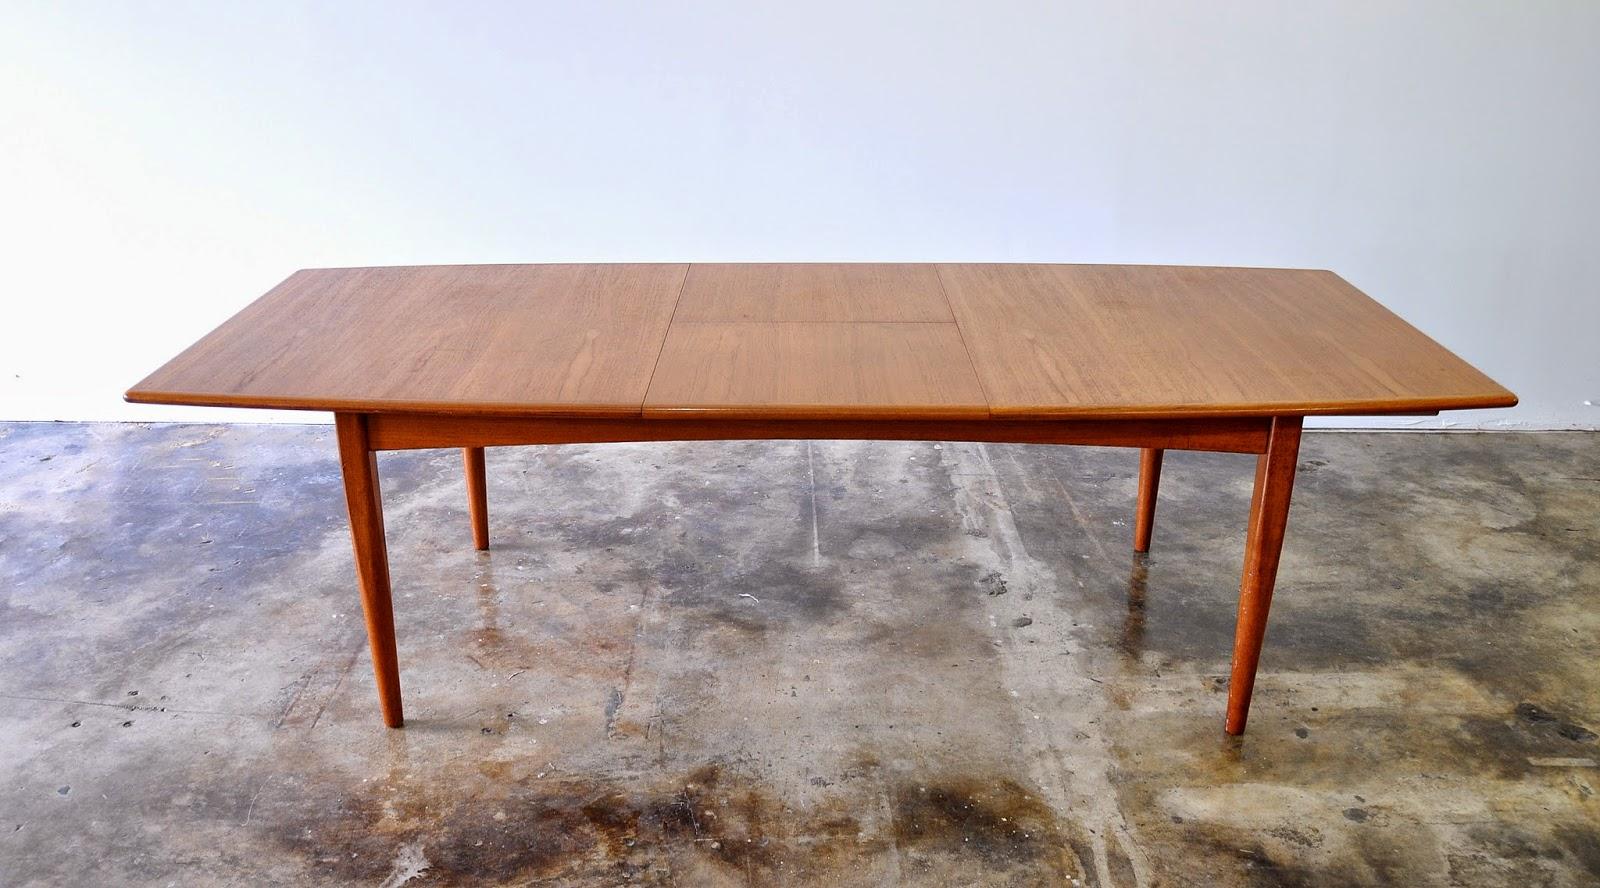 SELECT MODERN Falster Teak Expandable Dining Table : DanishModernFalsterTeakDiningTable3 from midcenturymoderndesignfinds.blogspot.com size 1600 x 888 jpeg 289kB